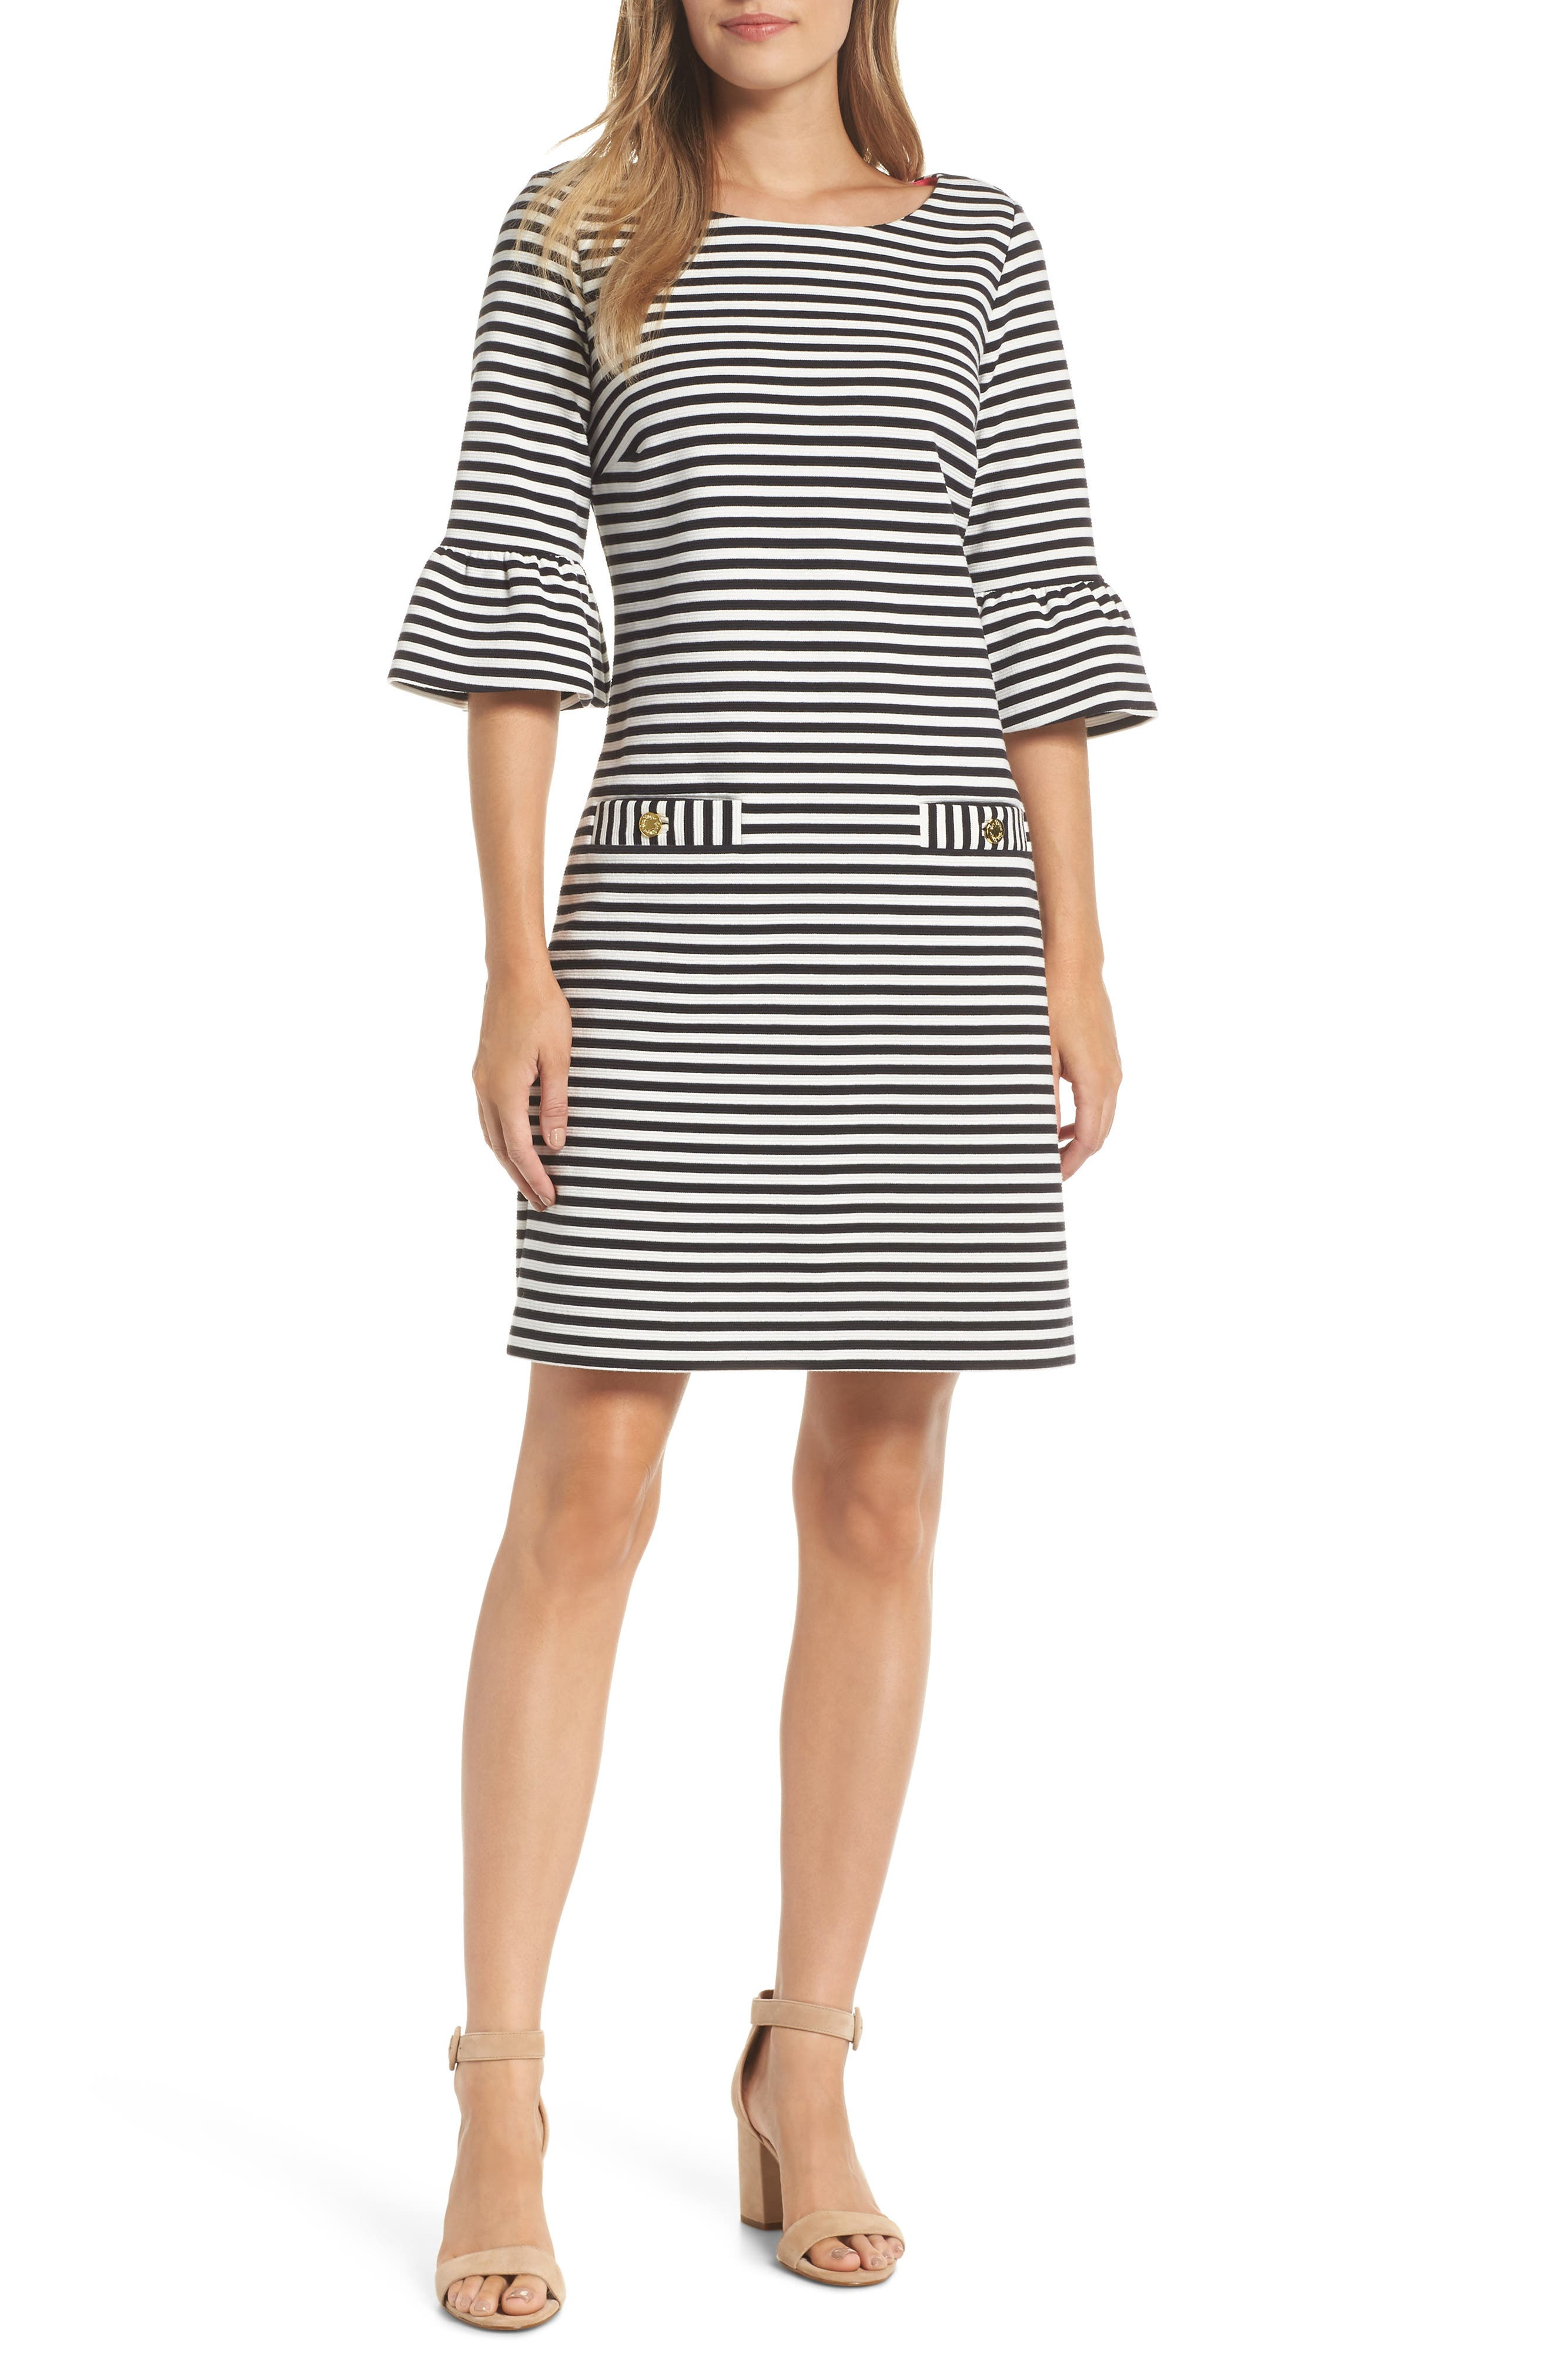 2cd70e7f5cfbbf Lilly Pulitzer Alden Stripe Shift Dress